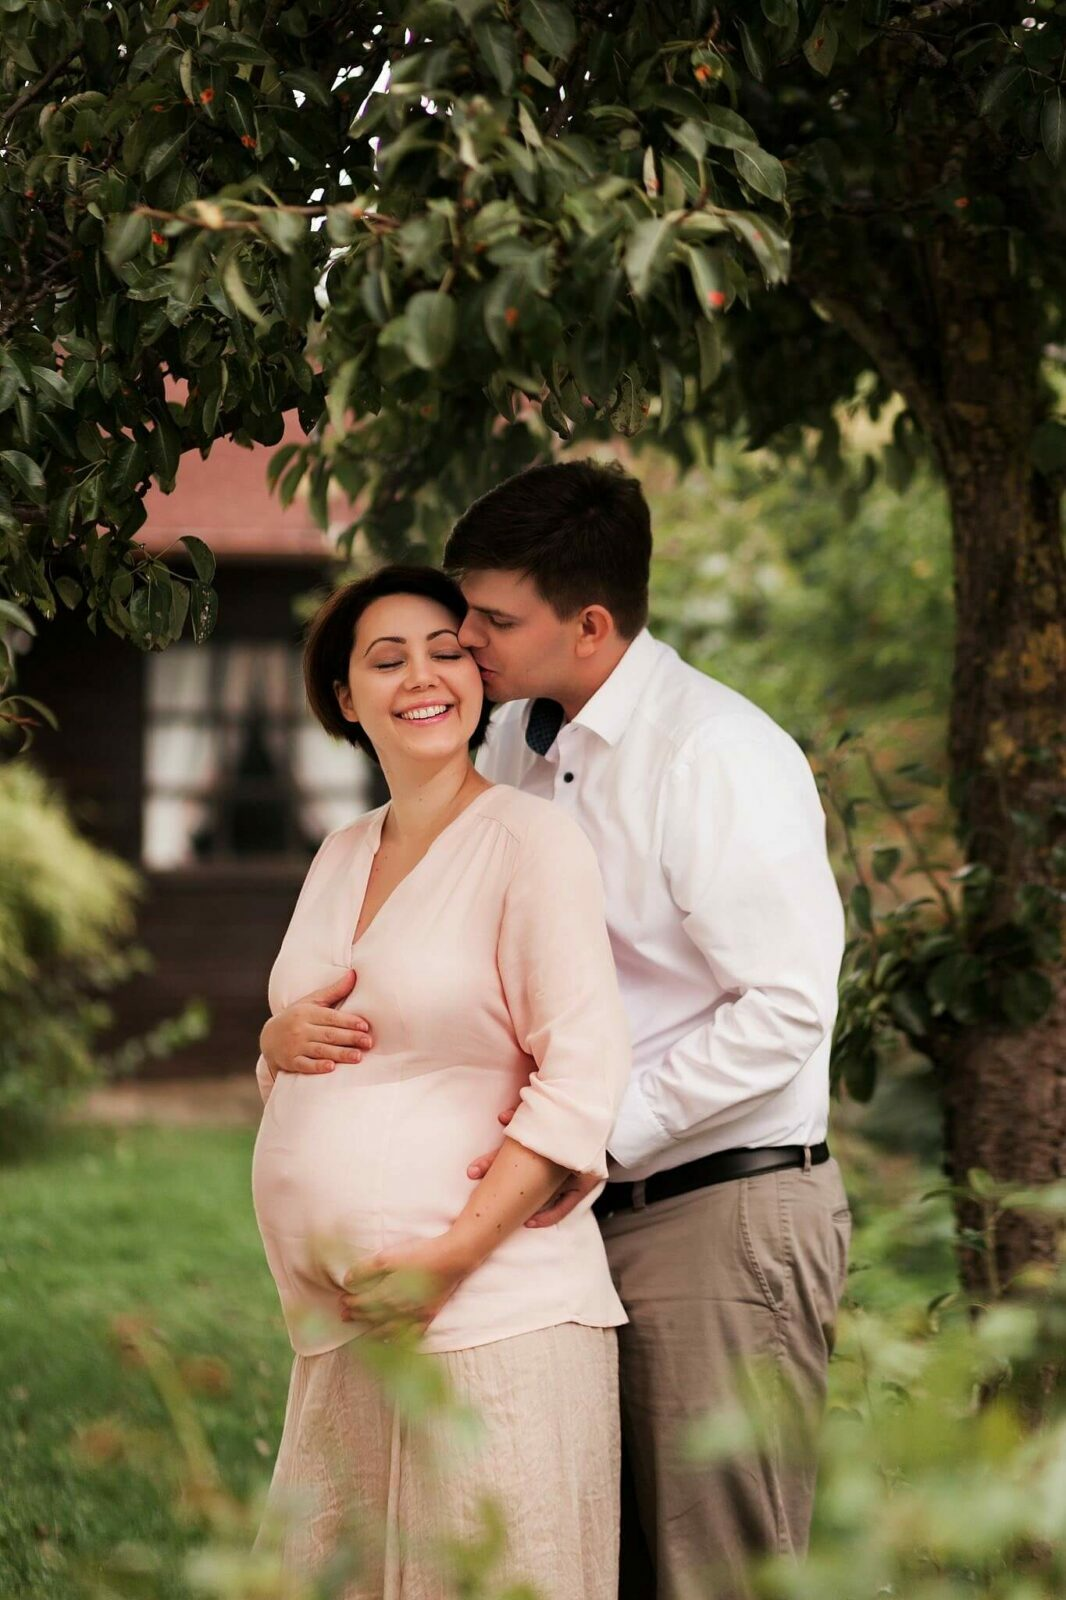 Outdoor Schwangerschaftsfotografie in munchen